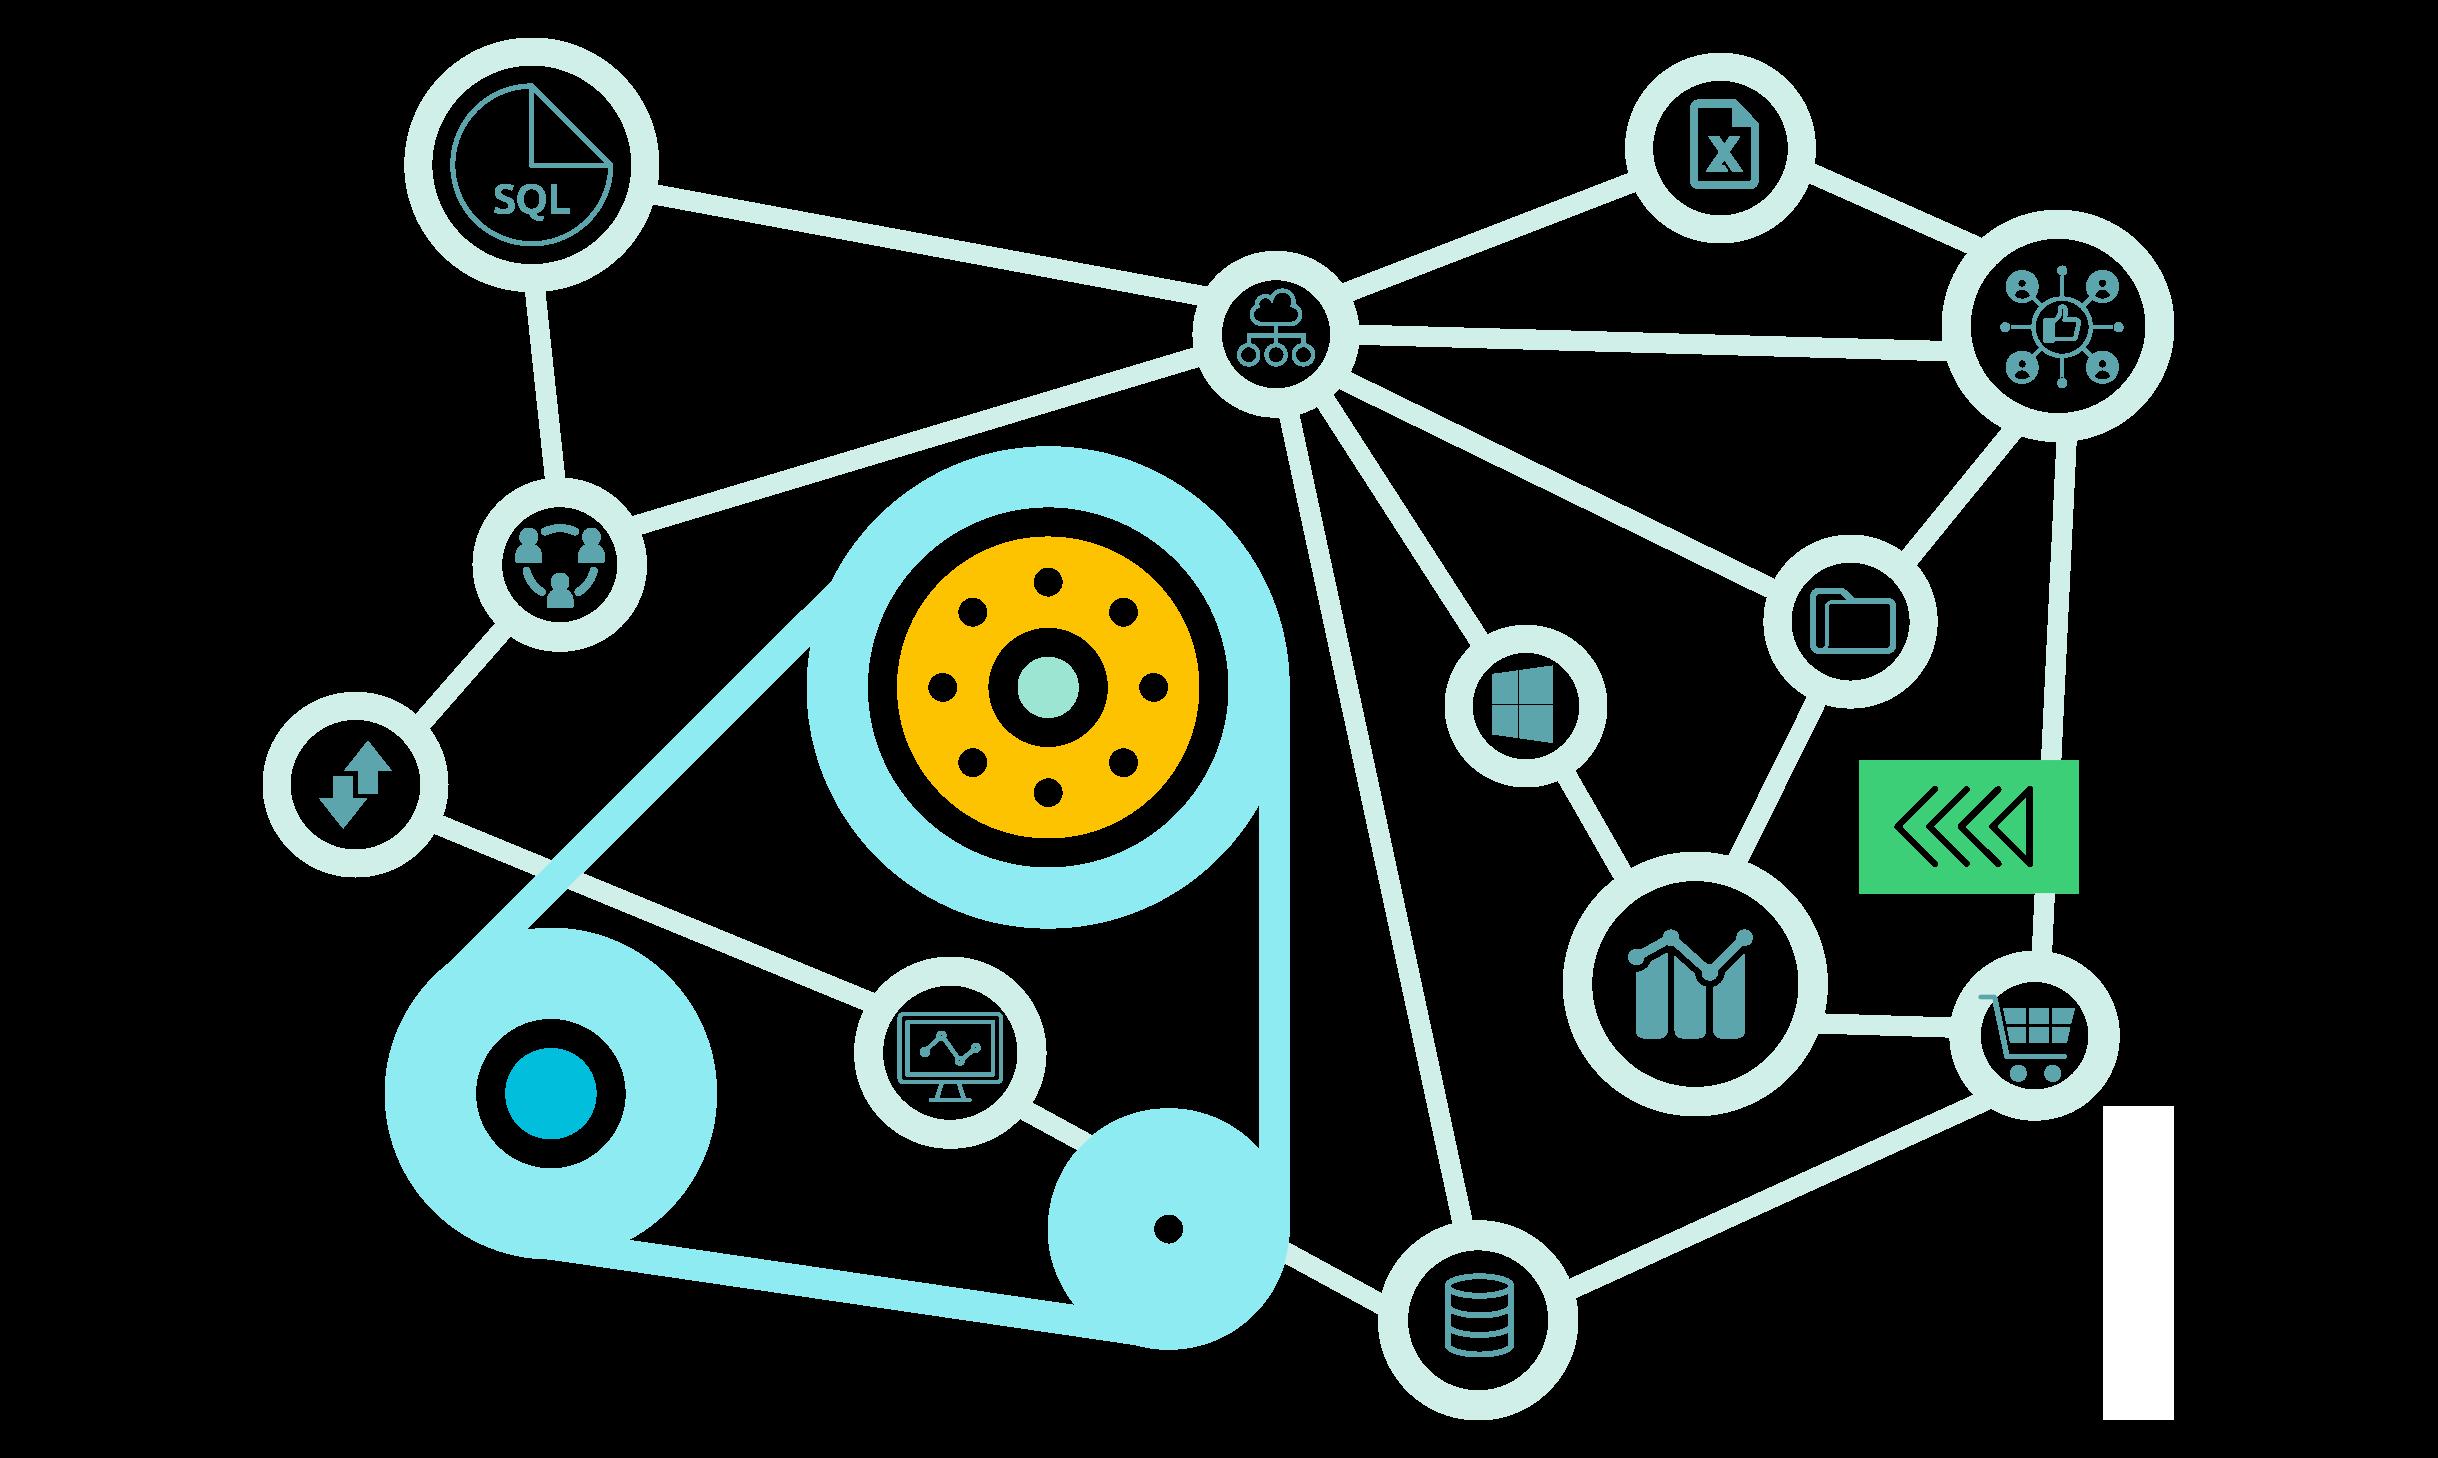 powerbi connect to any data source graphic - آموزش Power BI صفر تا سکو : قسمت دوم (اتصال به منابع داده در Power BI)